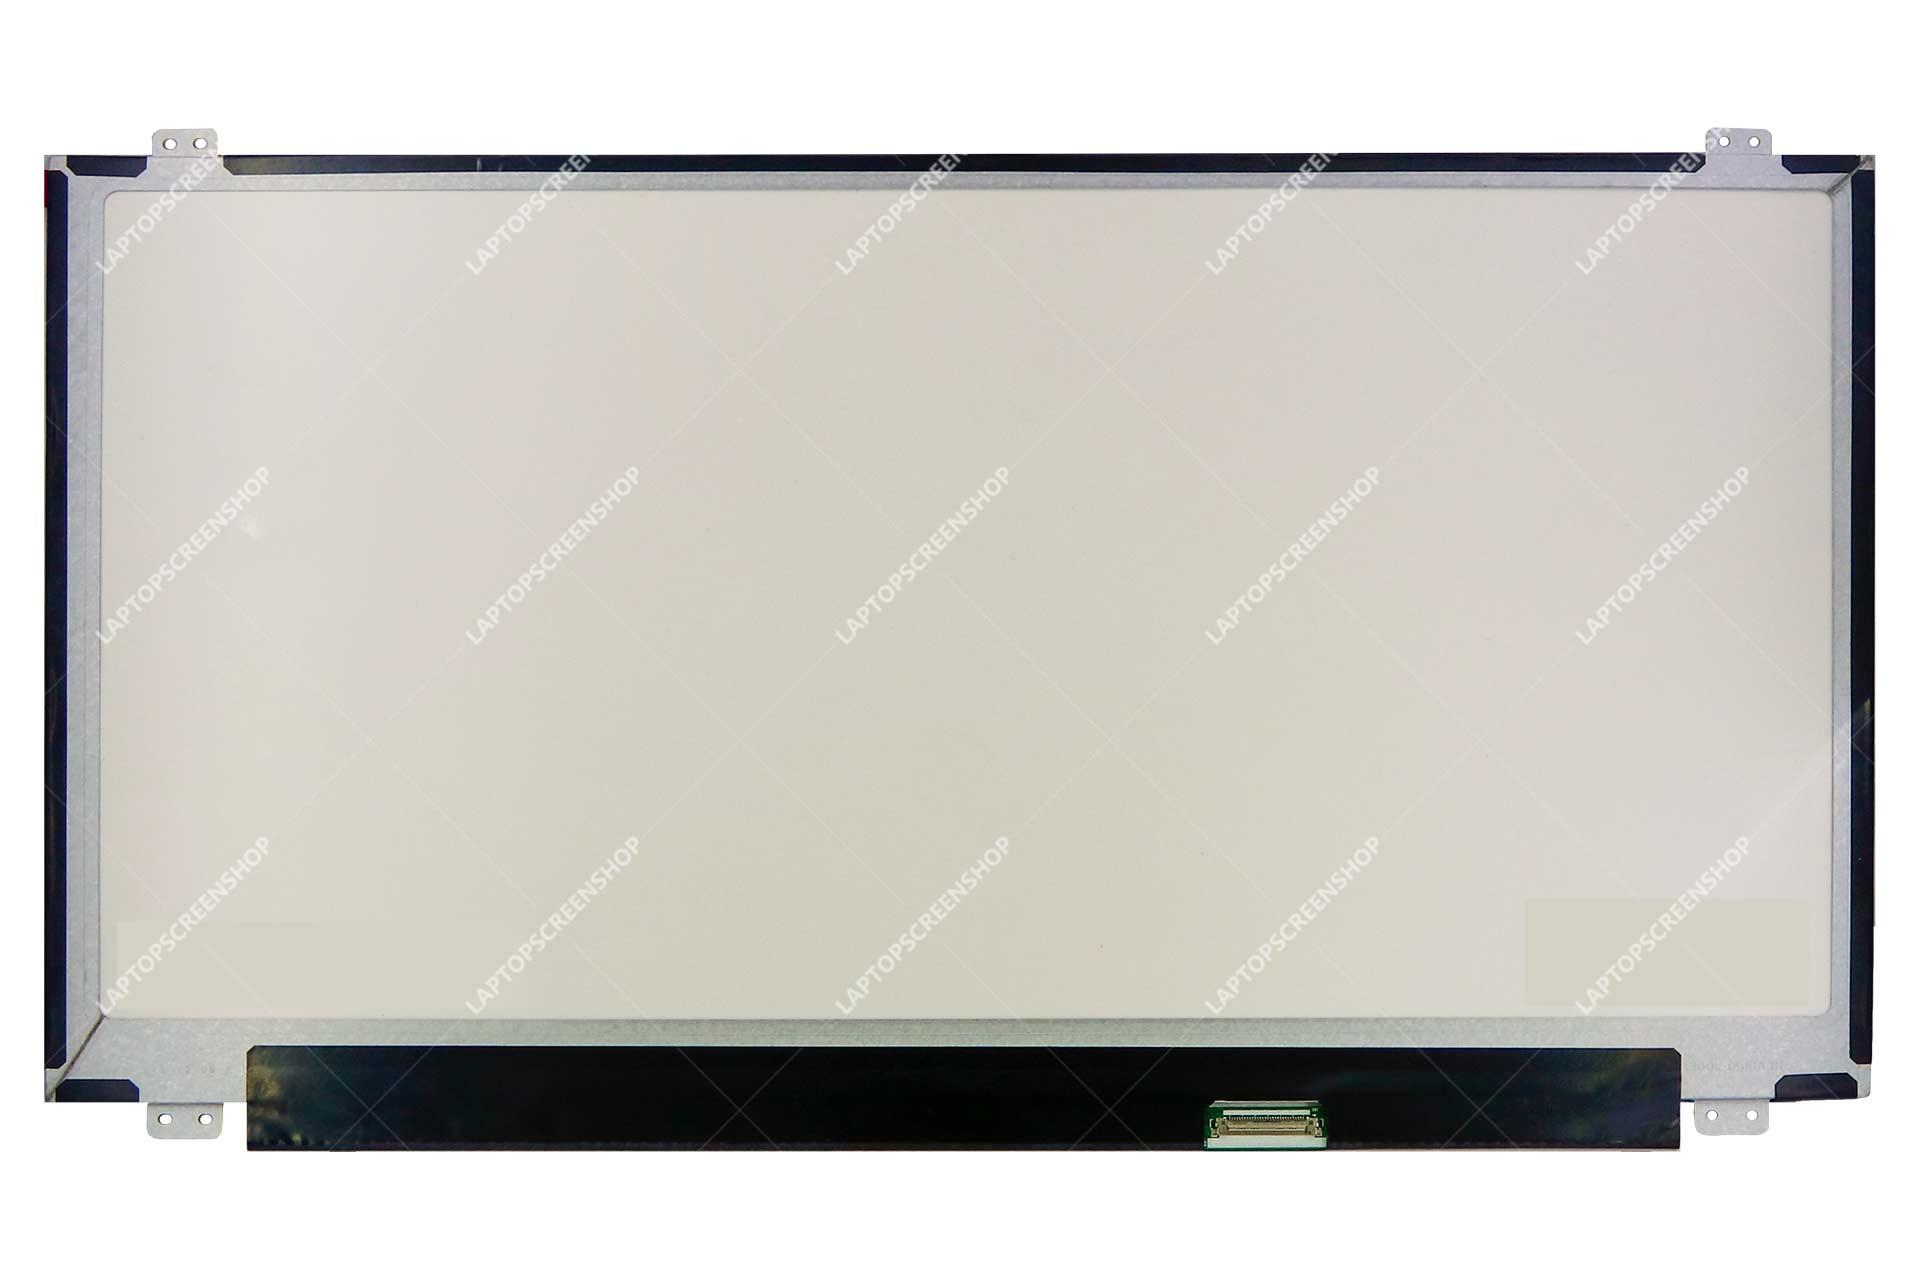 ACER-ASPIRE-E1-532-4646-LCD |HD|فروشگاه لپ تاپ اسکرين | تعمير لپ تاپ